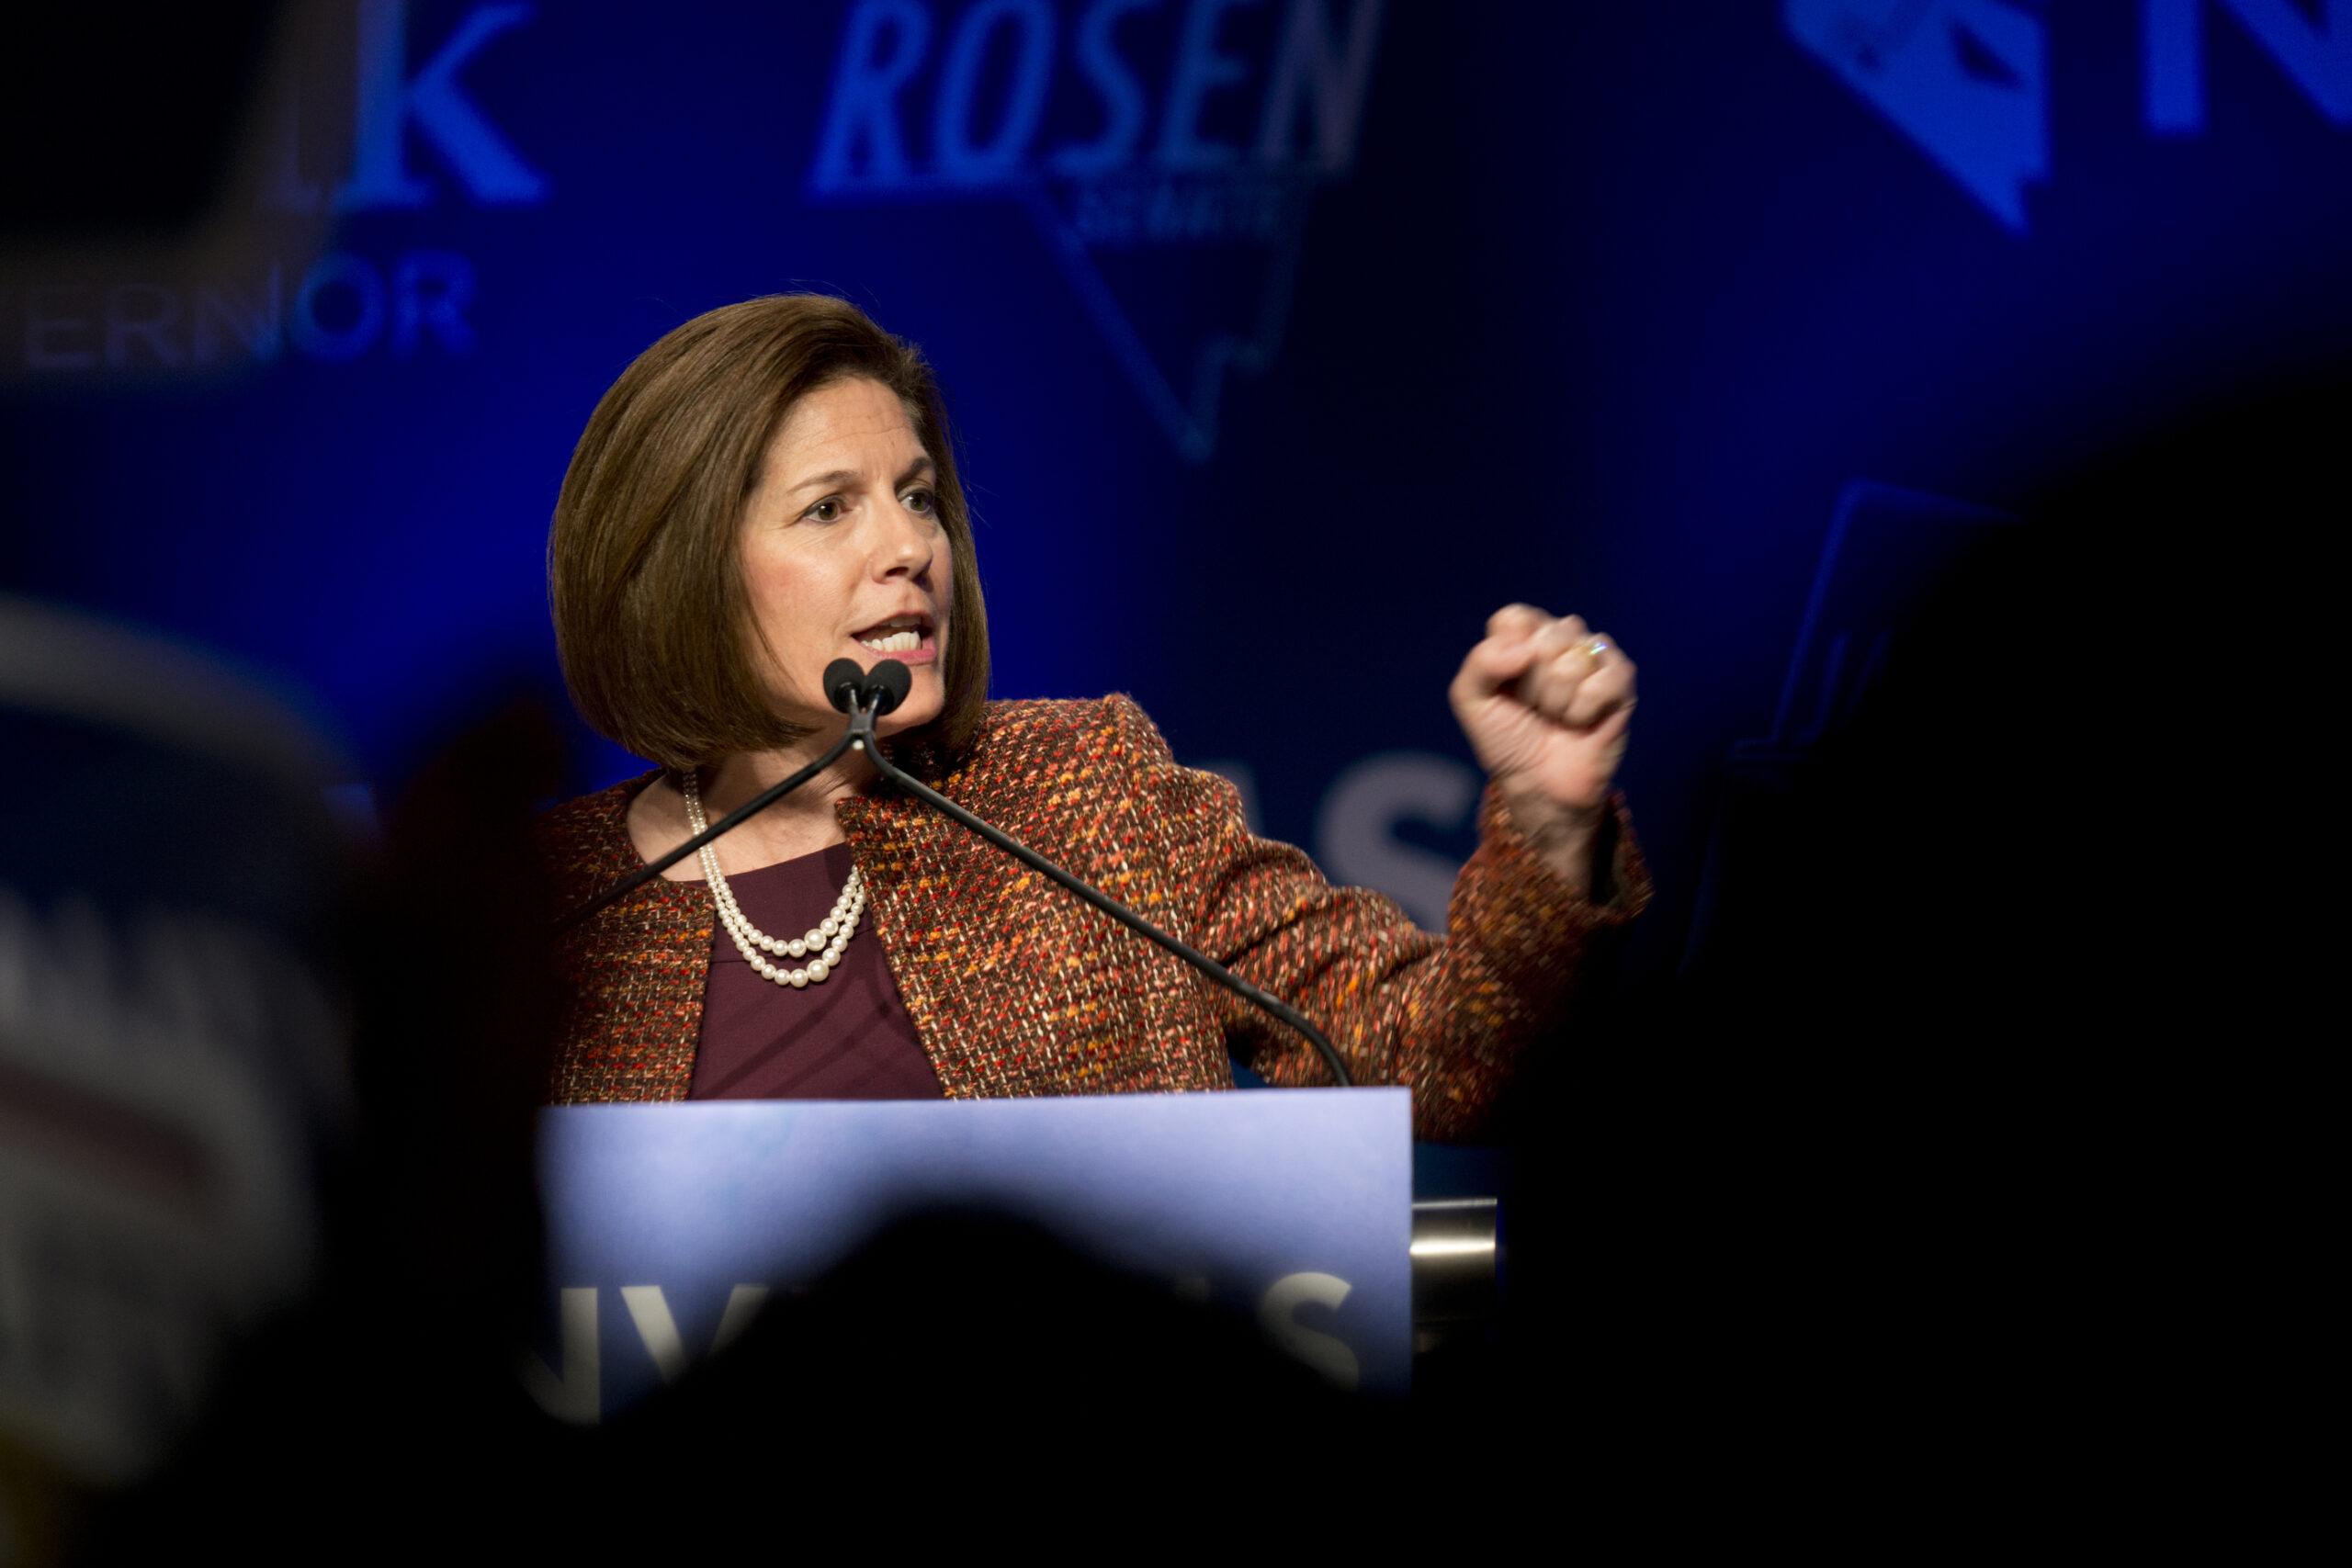 Senator Catherine Cortez Masto speaking into a microphone behind a podium